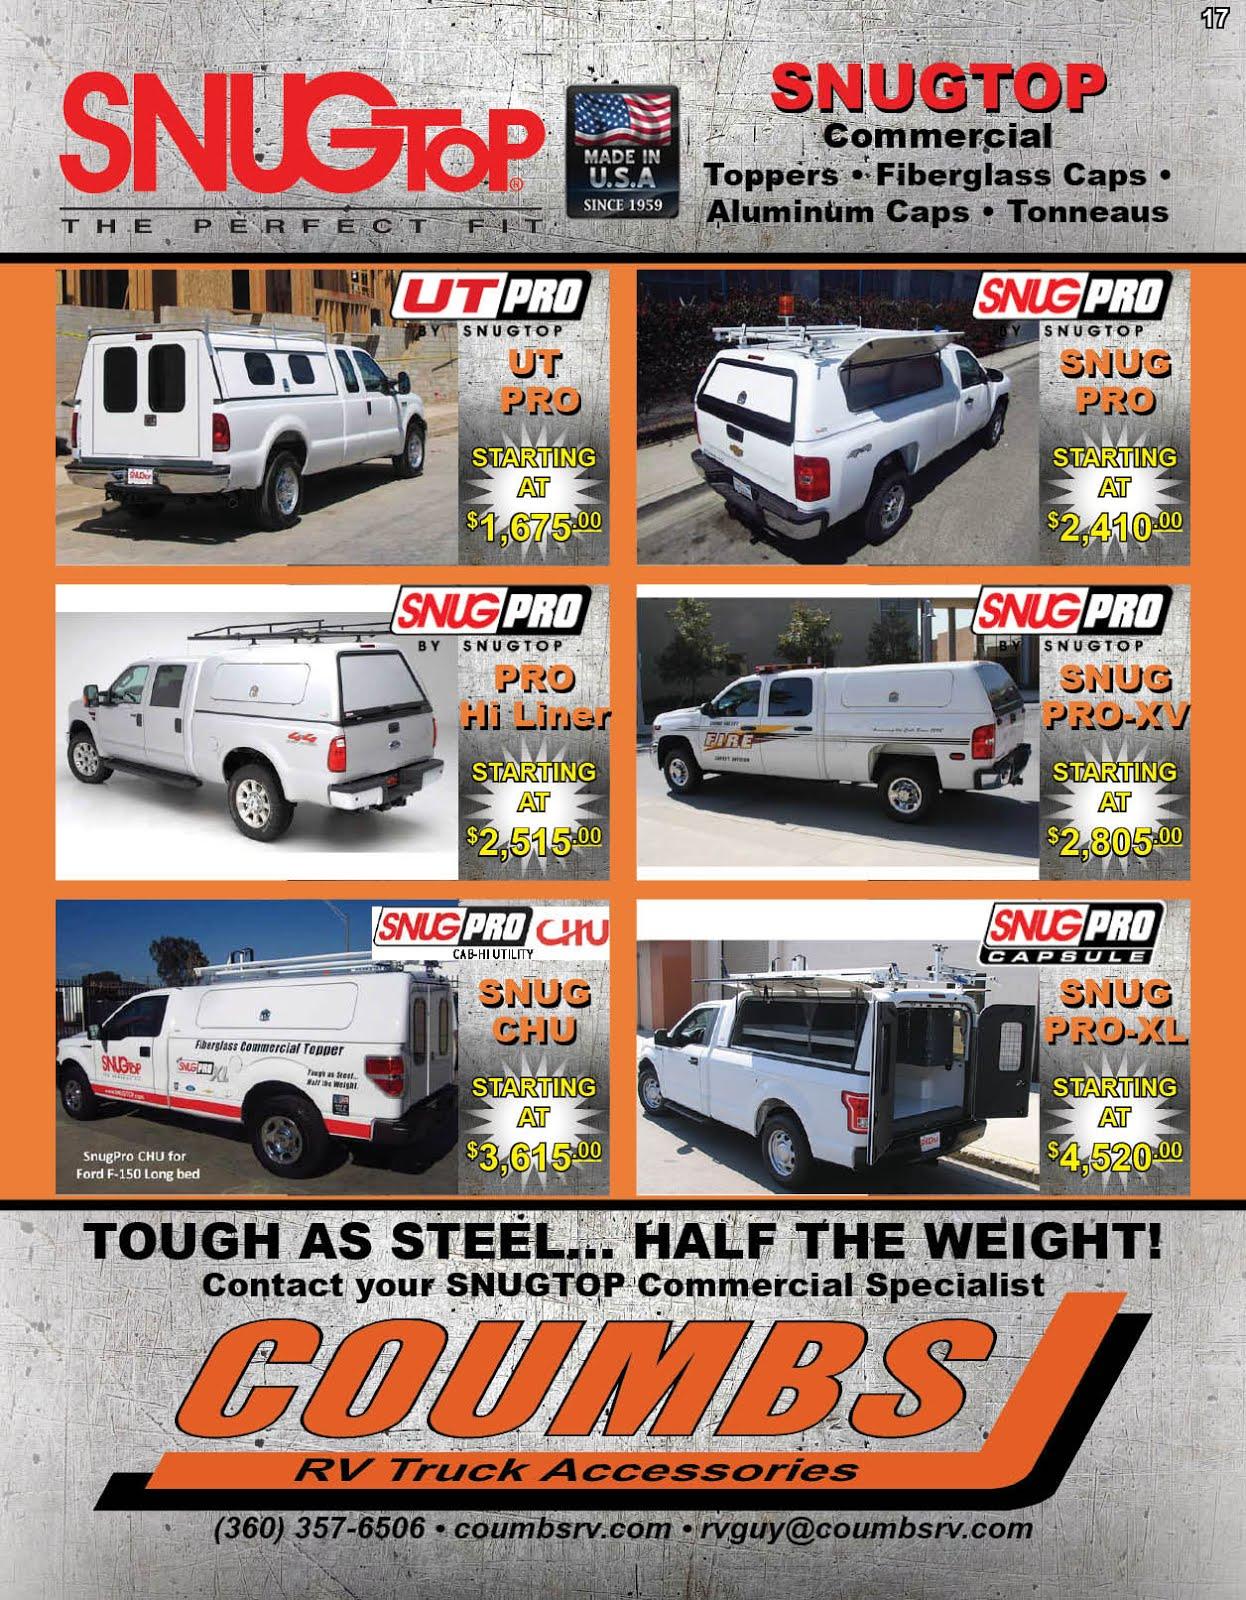 Coumbs RV &Truck Accessories